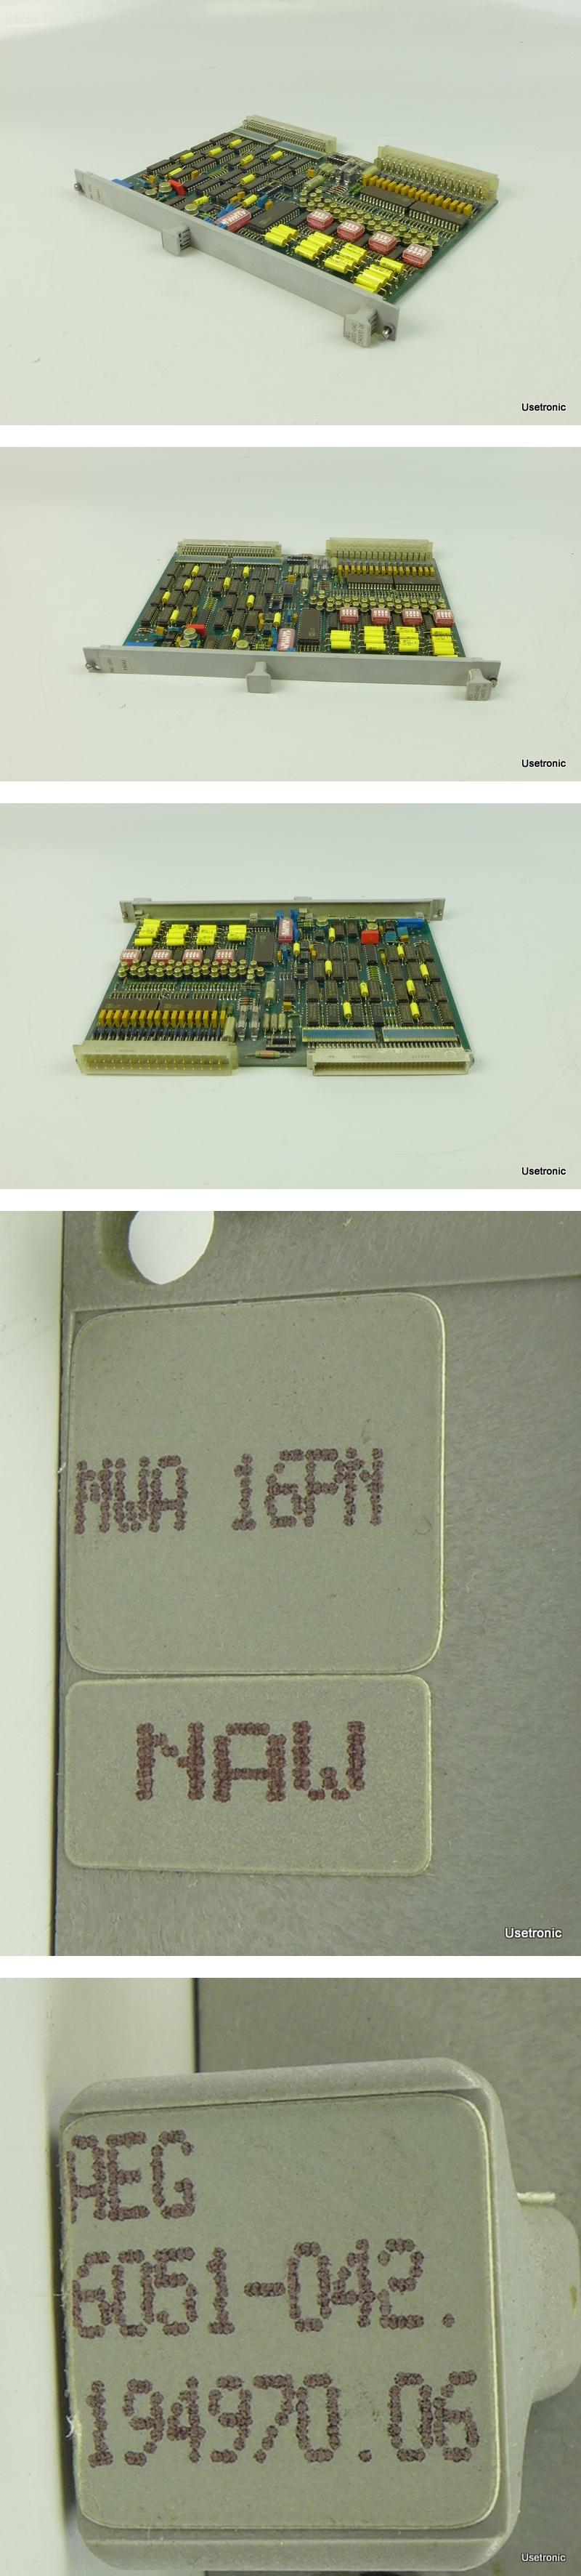 AEG MWA-16PN